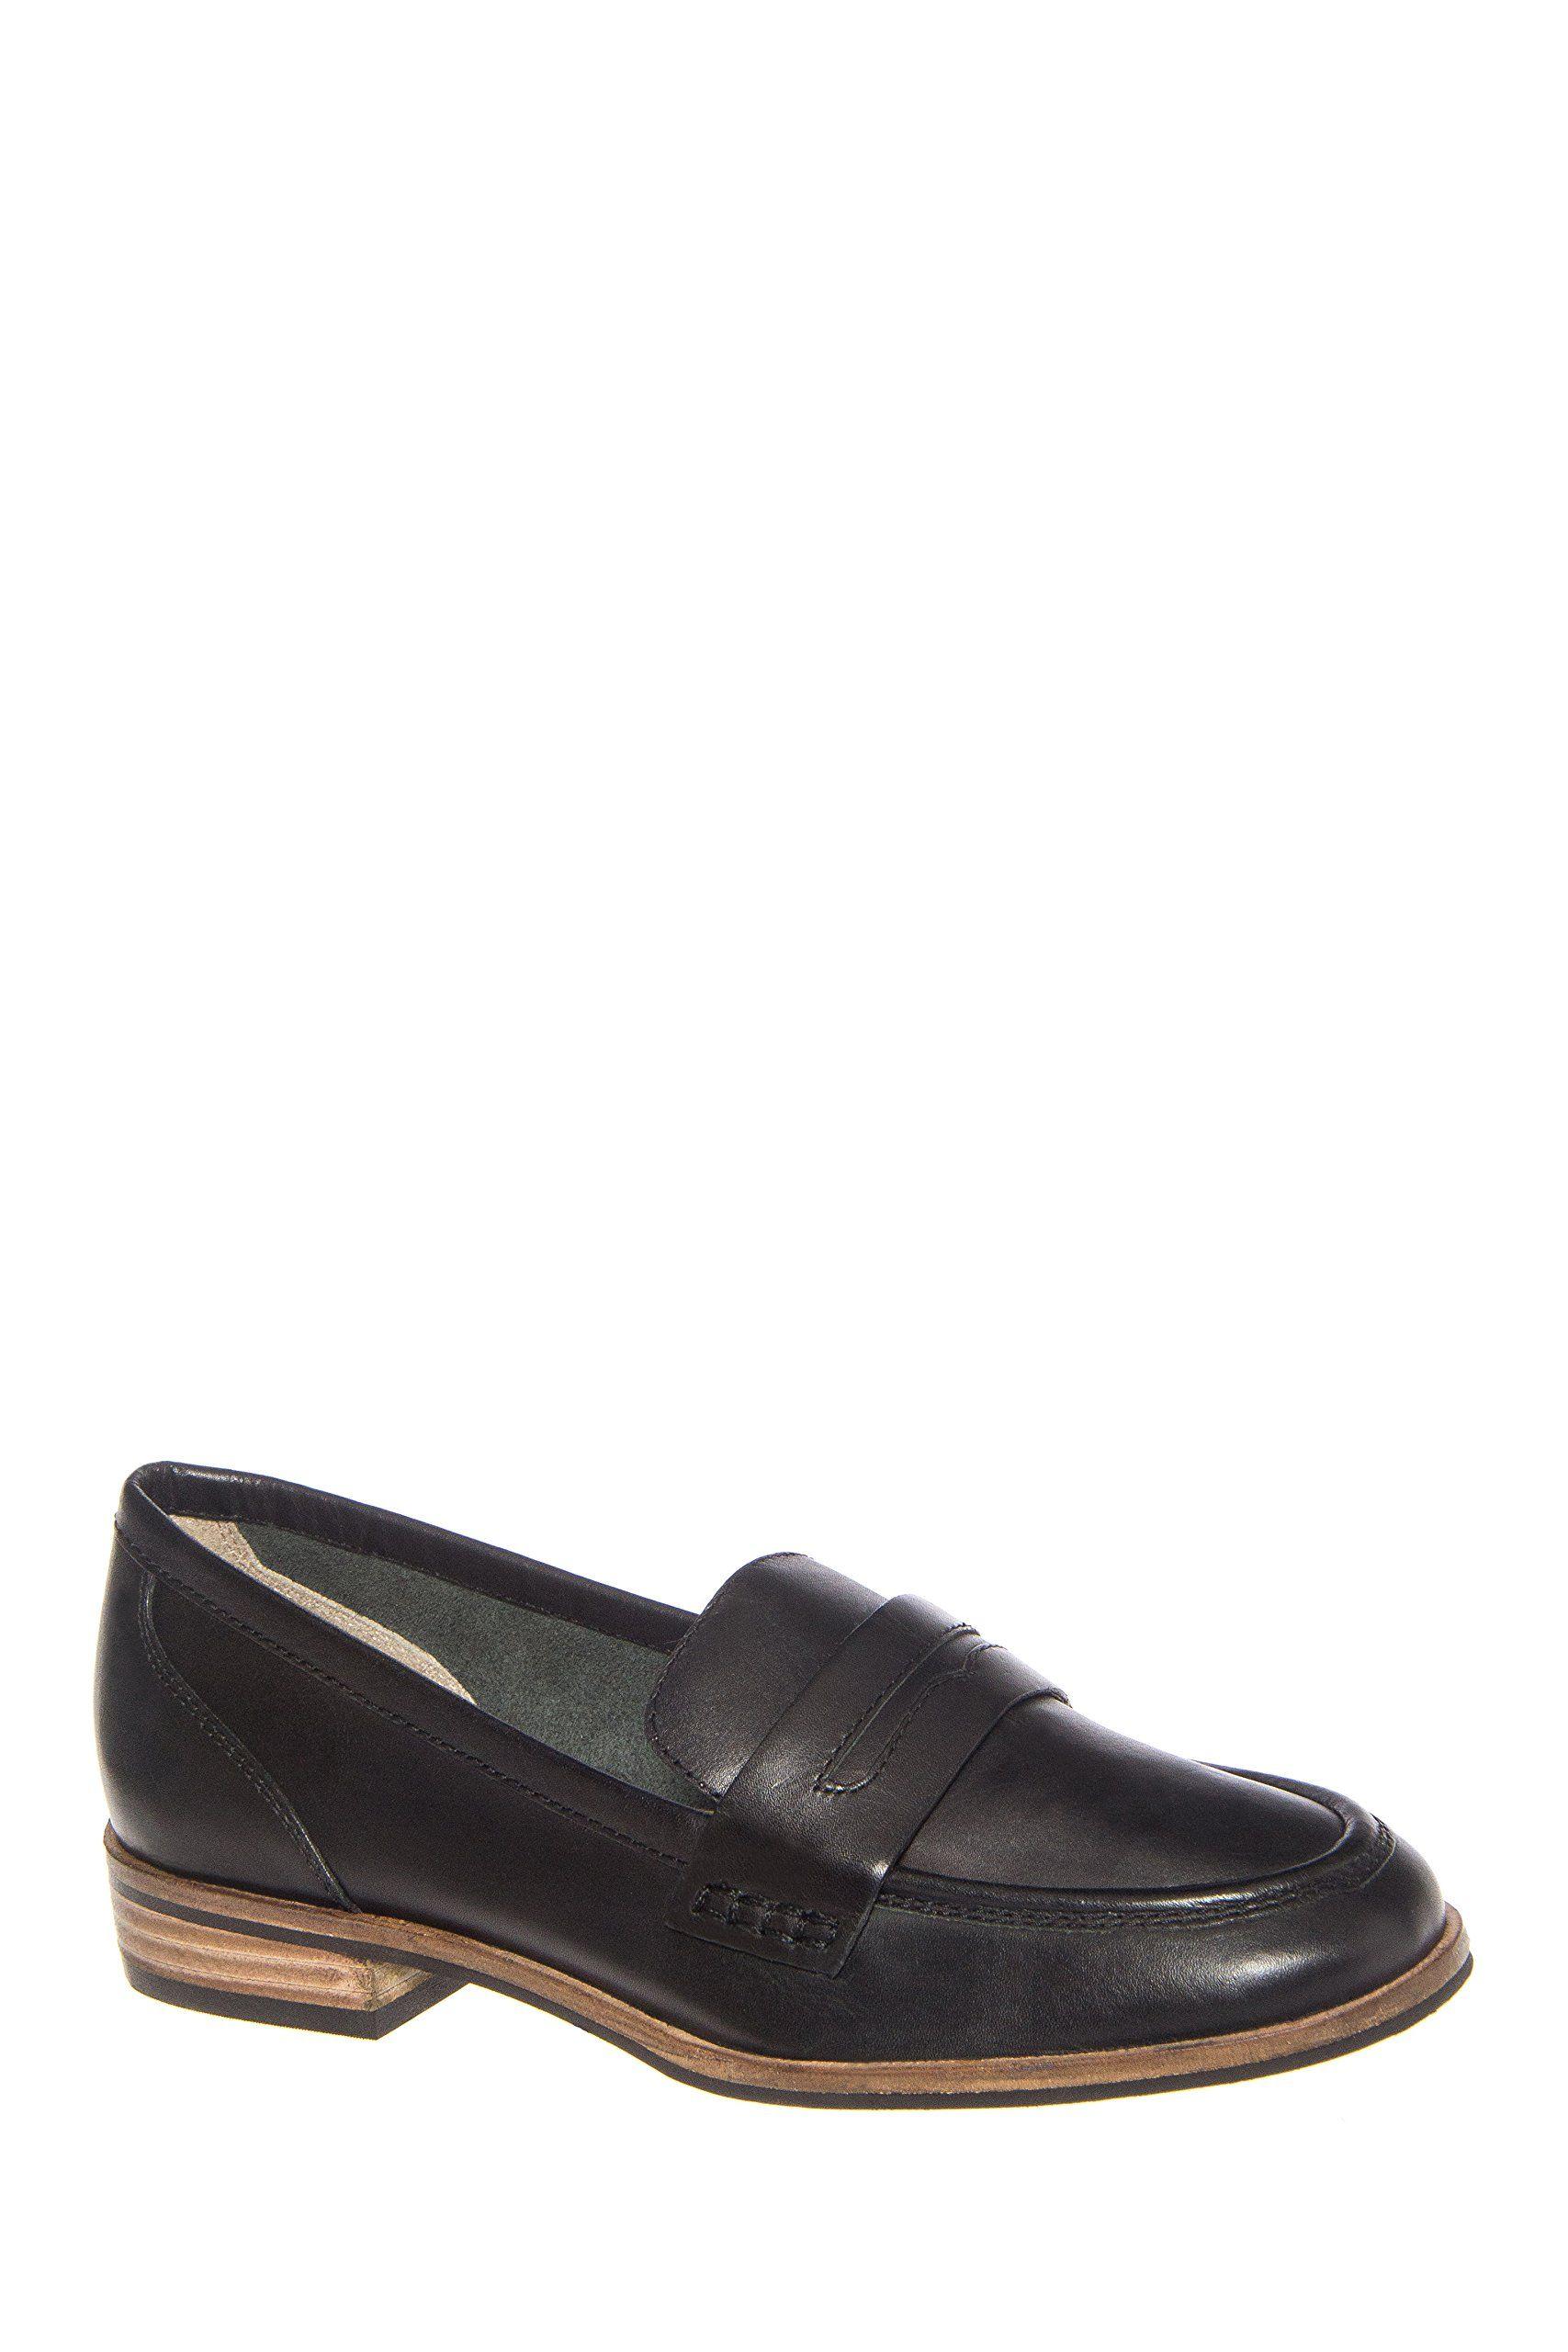 f9f597d73d4ea Amazon.com: Seychelles Women's Tigers Eye Boat Shoe: Shoes | Shoes ...